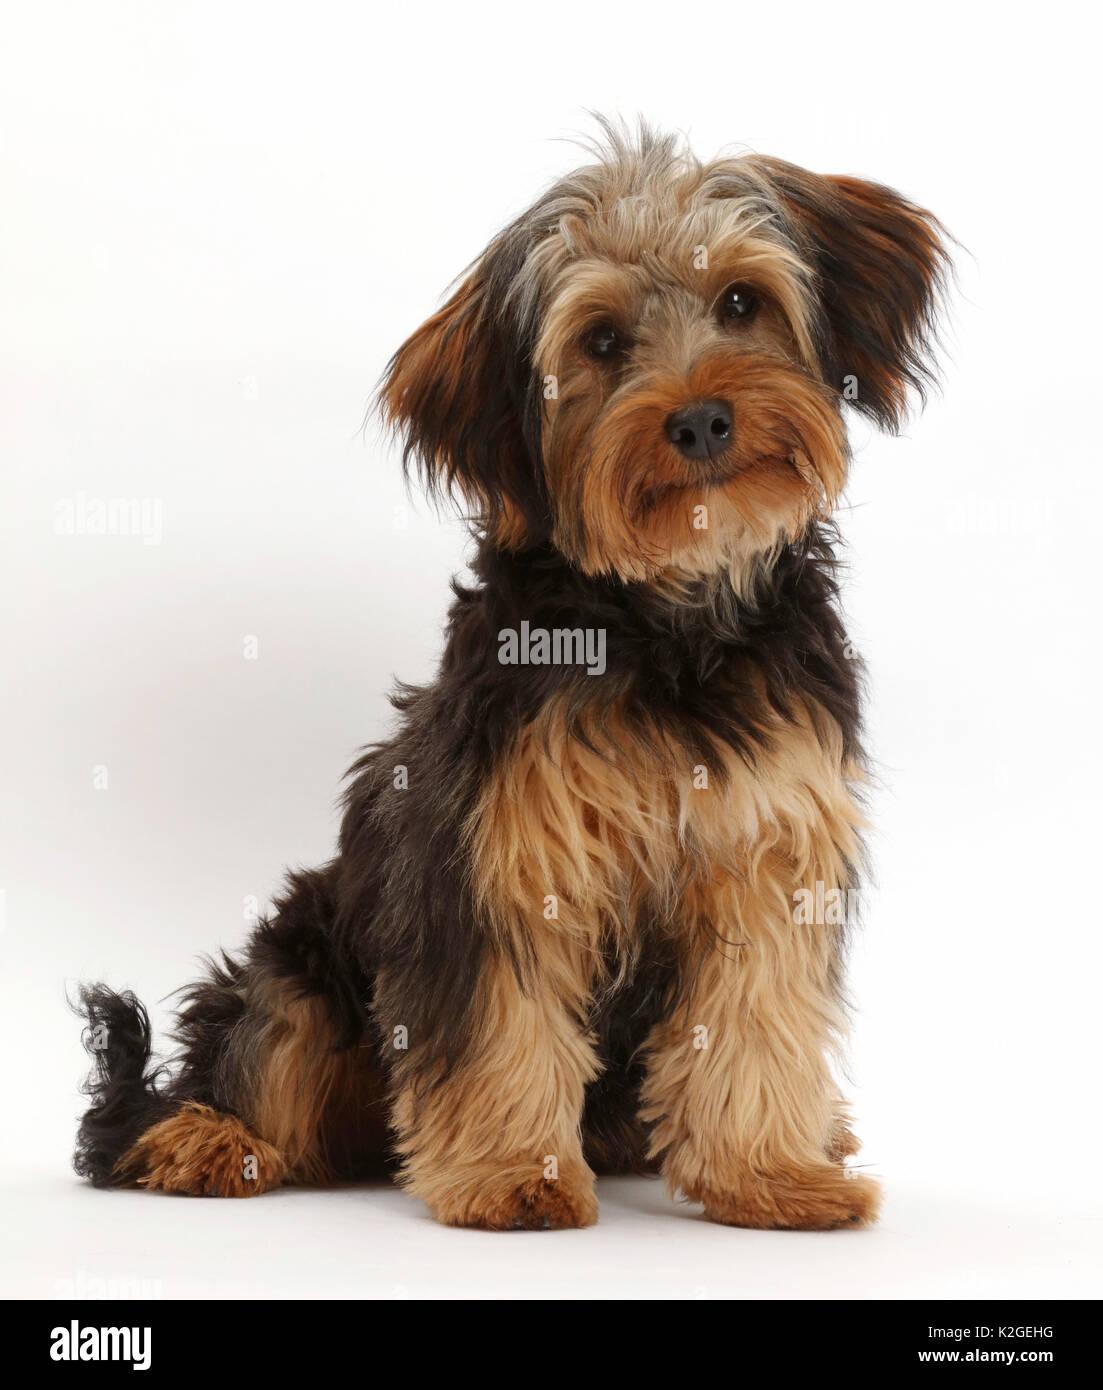 Yorkipoo Hund, Yorkshire Terrier Kreuz Pudel, Oscar, im Alter von 6 Monaten. Stockbild